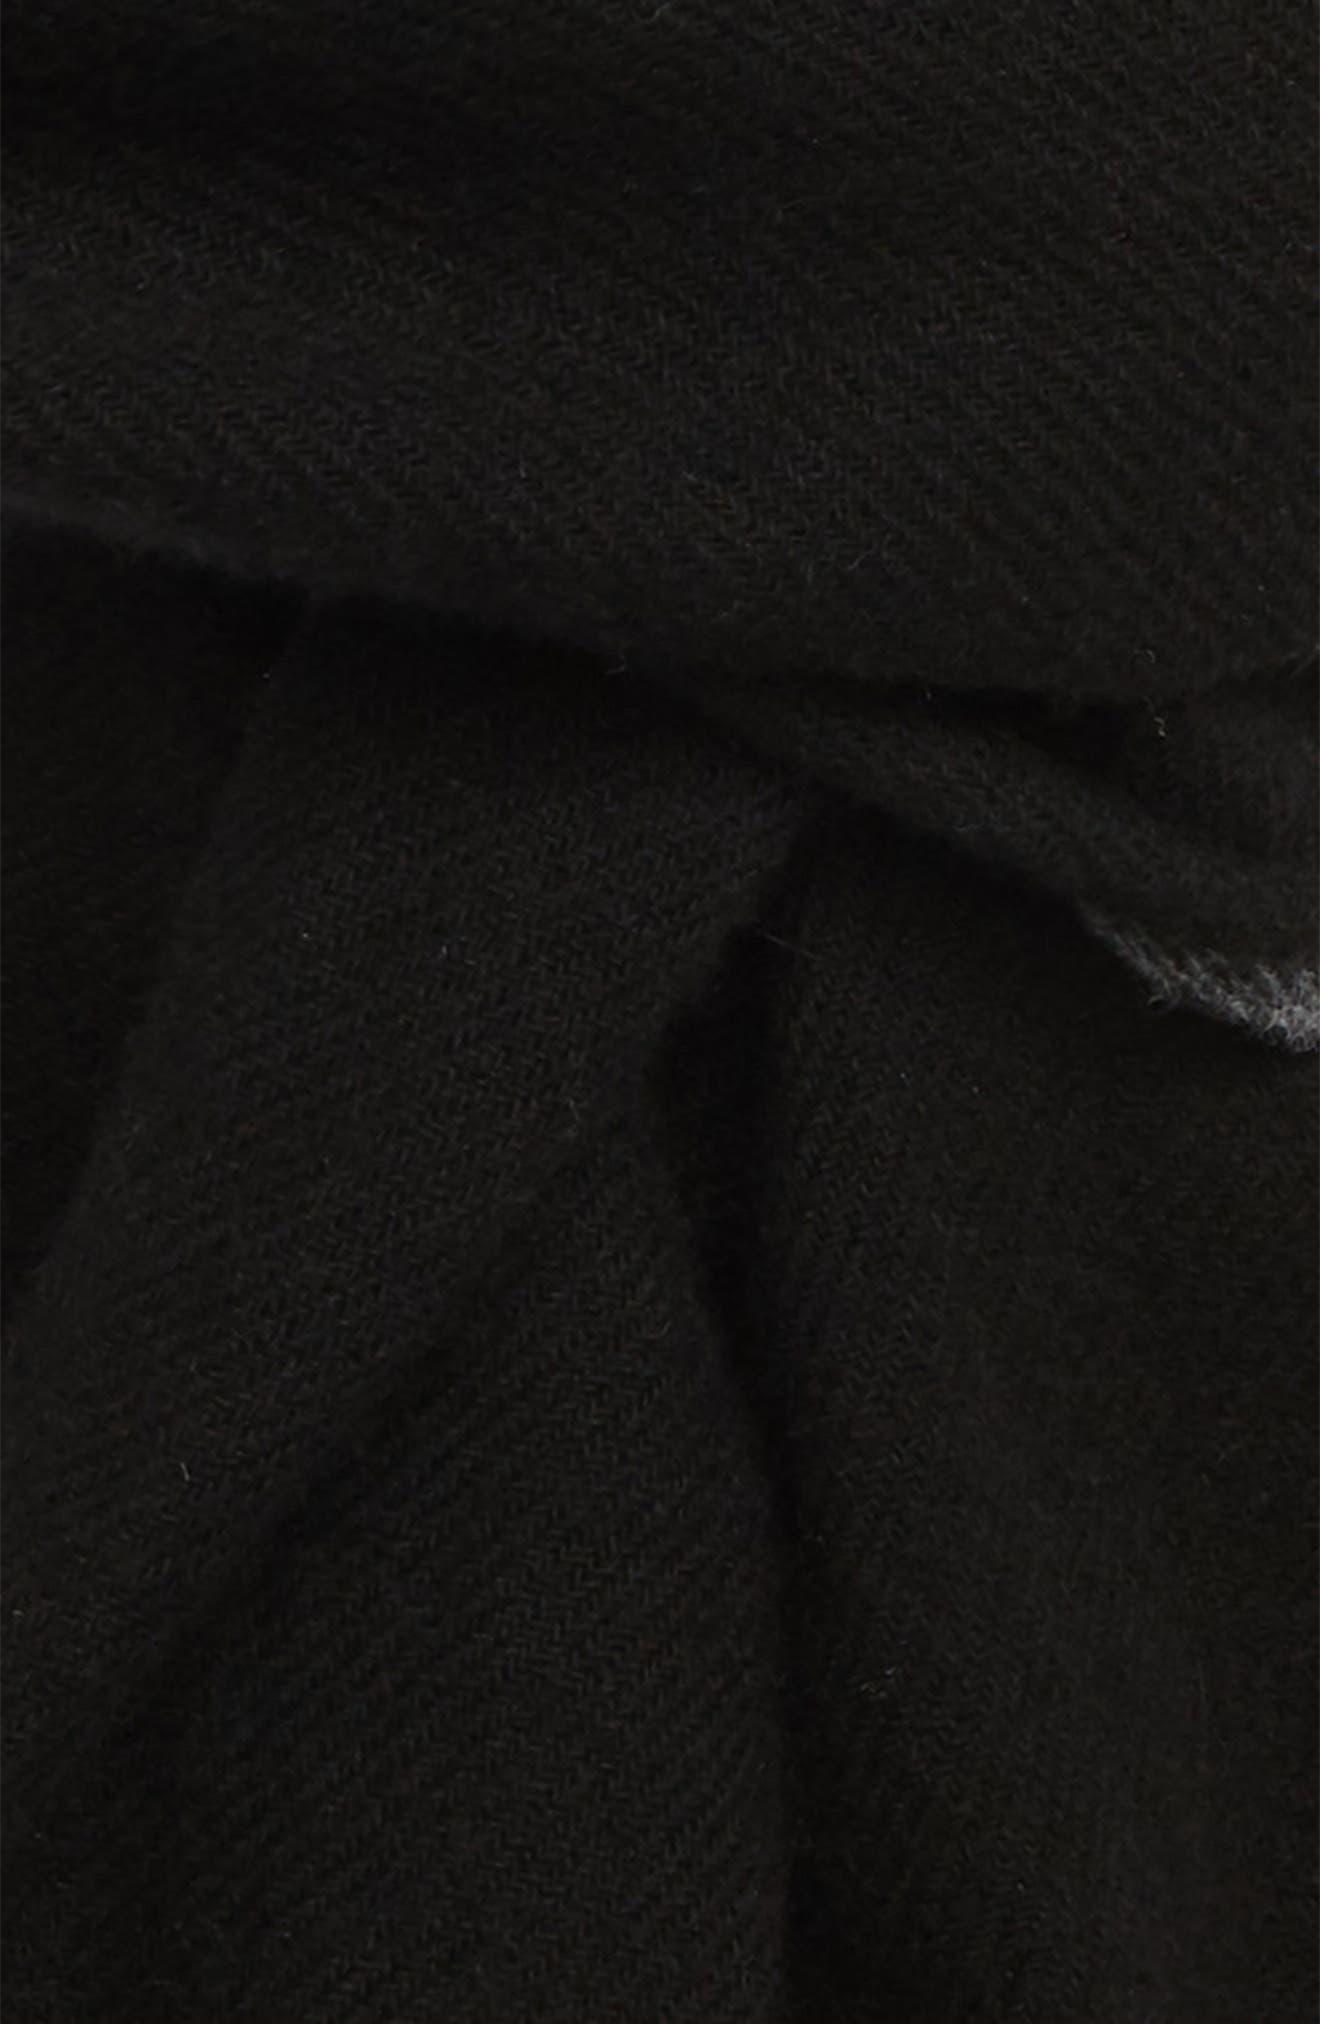 Cashmere Scarf,                             Alternate thumbnail 3, color,                             BLACK/ GREY